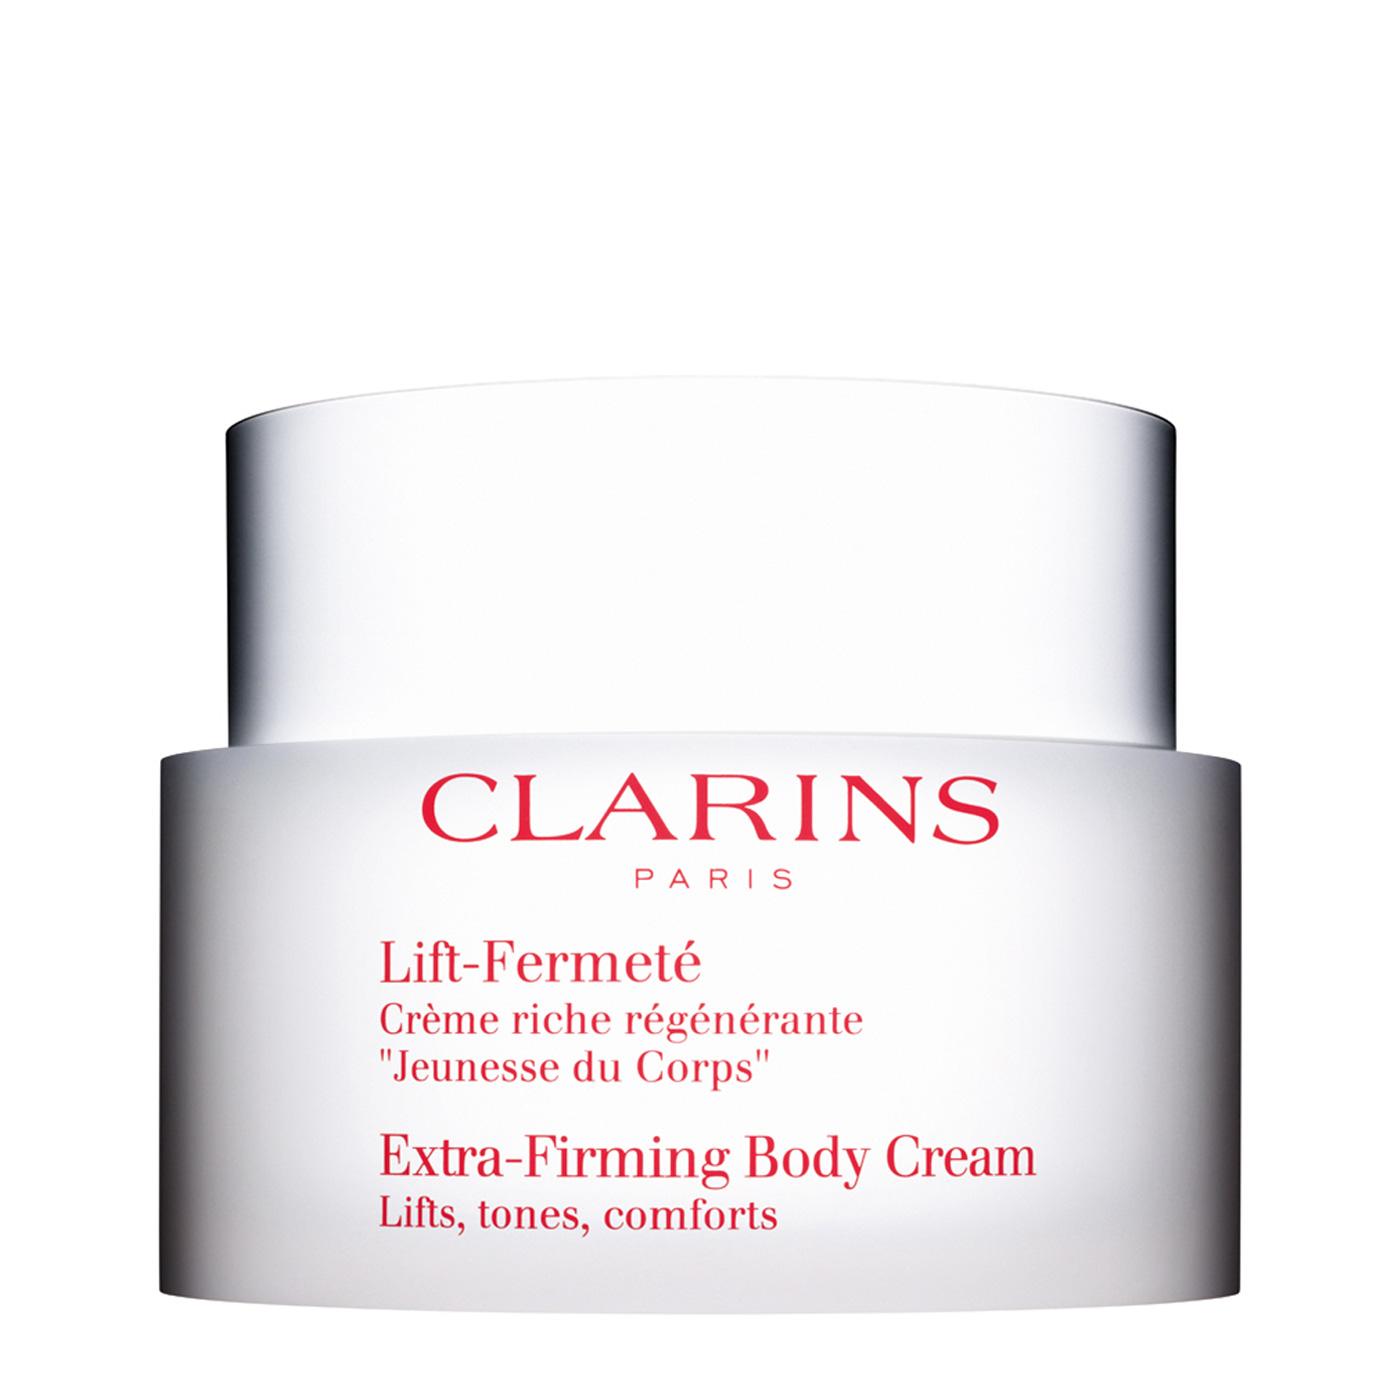 Dejlig Extra-Firming Body Cream, lifts, tones, comforts, Body   Clarins TQ-75